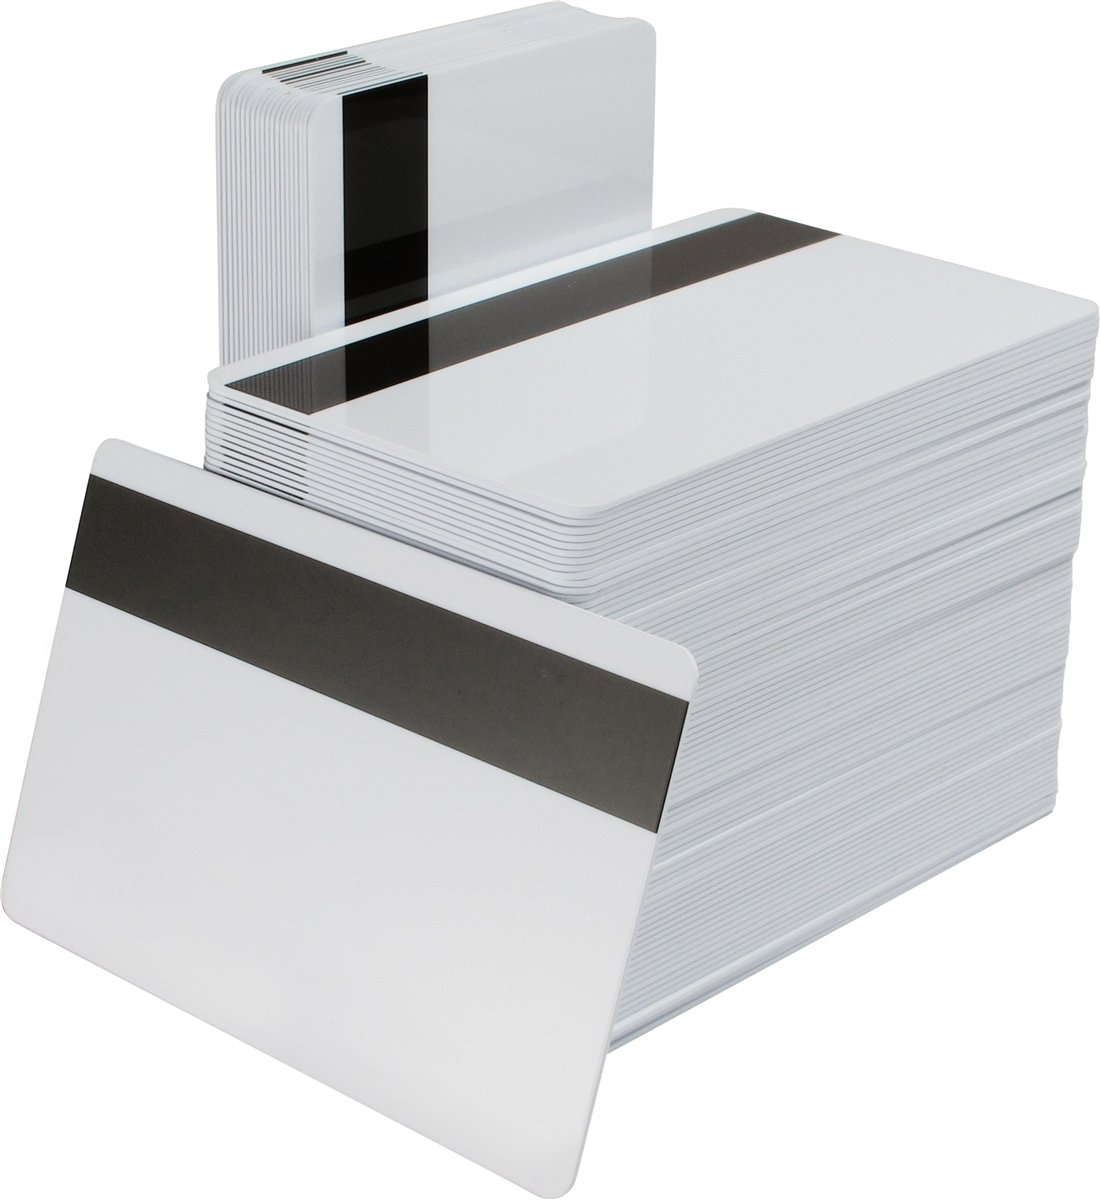 Karten, Zebra Premier Signature Panel PVC, weiß, 30 mil mit Signaturfeld, Magnetstreifen (hohe Koerzivität)